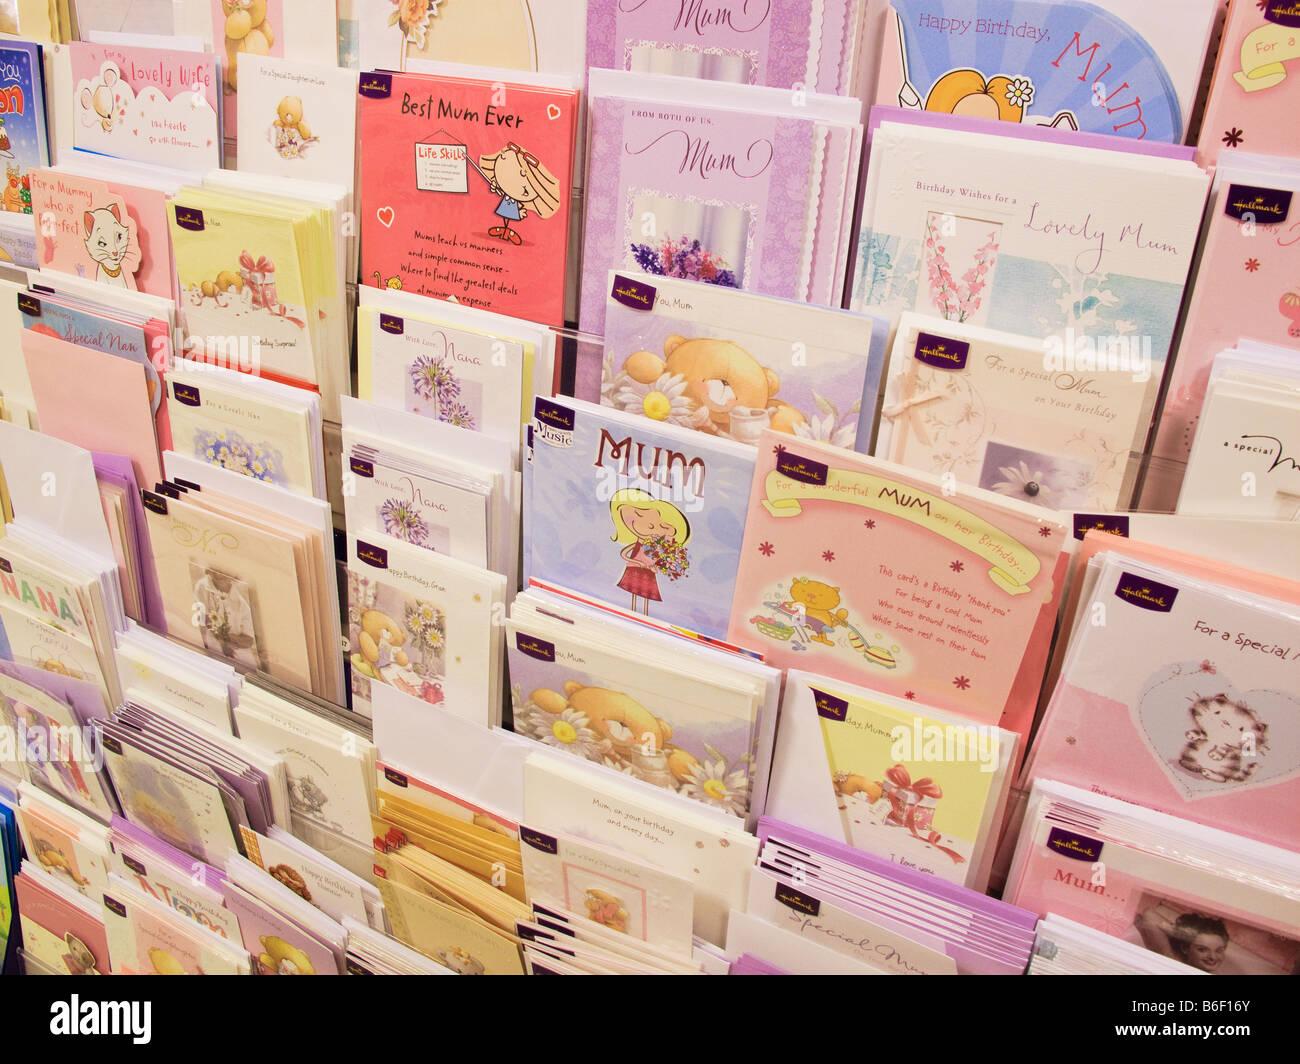 Greeting cards in rack in morrisons supermarket gibraltar stock greeting cards in rack in morrisons supermarket gibraltar kristyandbryce Gallery